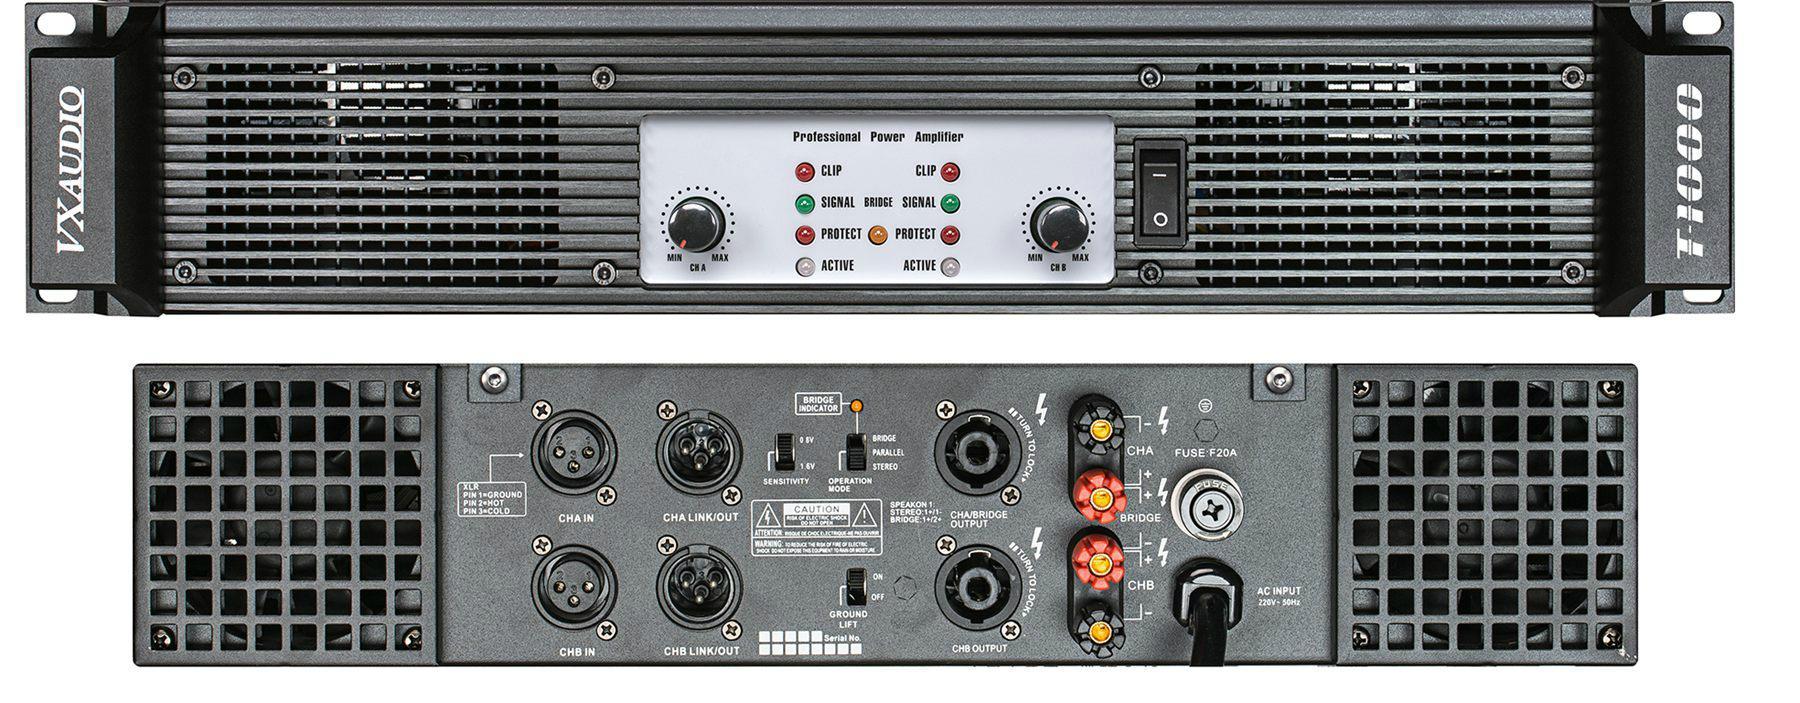 High Power Output Of Professional Amplifier T 800 Vx 4